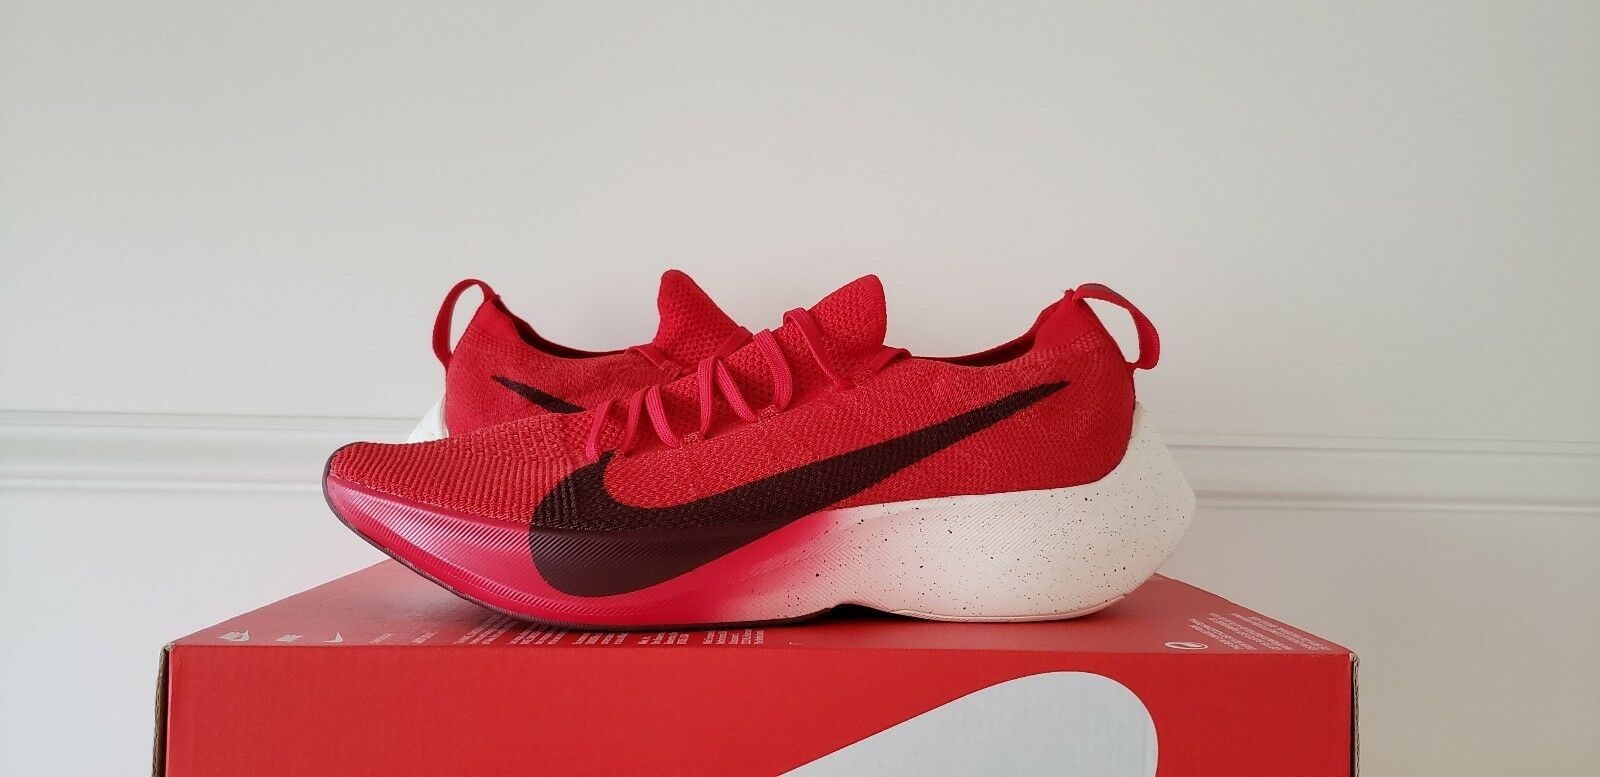 Nike Red Vapor Street Flyknit Team Red Nike [AQ1763 600] Size 10.5 React 93b0d6